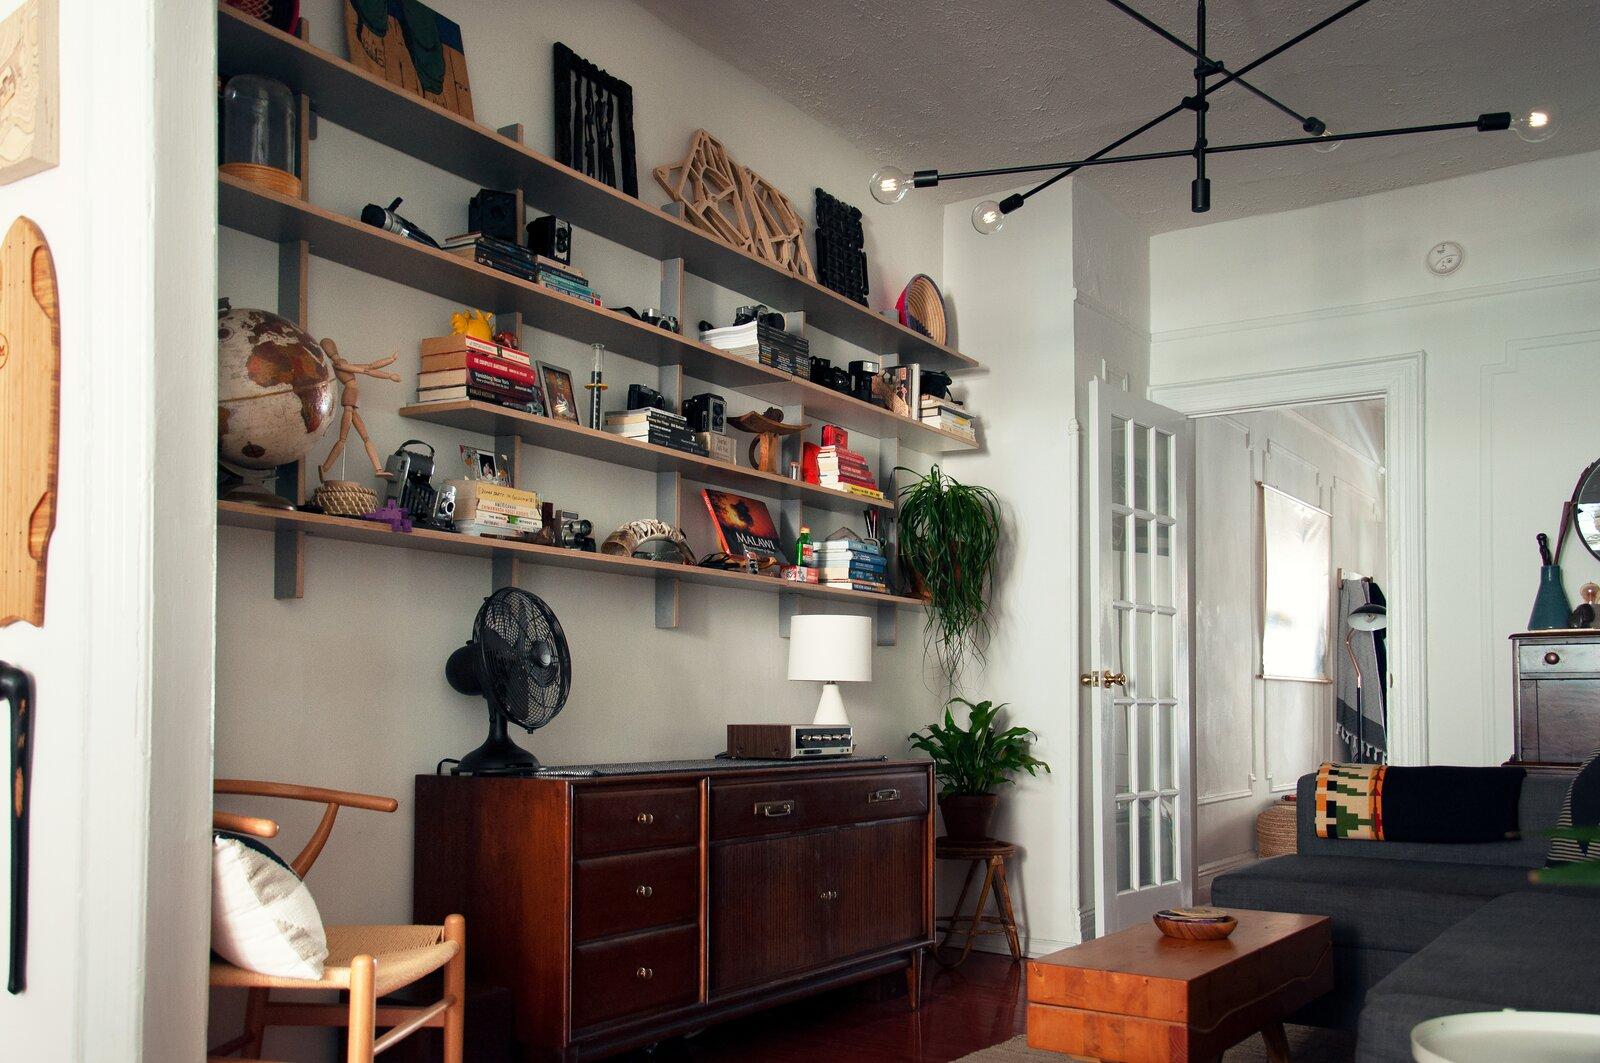 Queens rental apartment by Jordan Meerdink and Shalini Amin living room